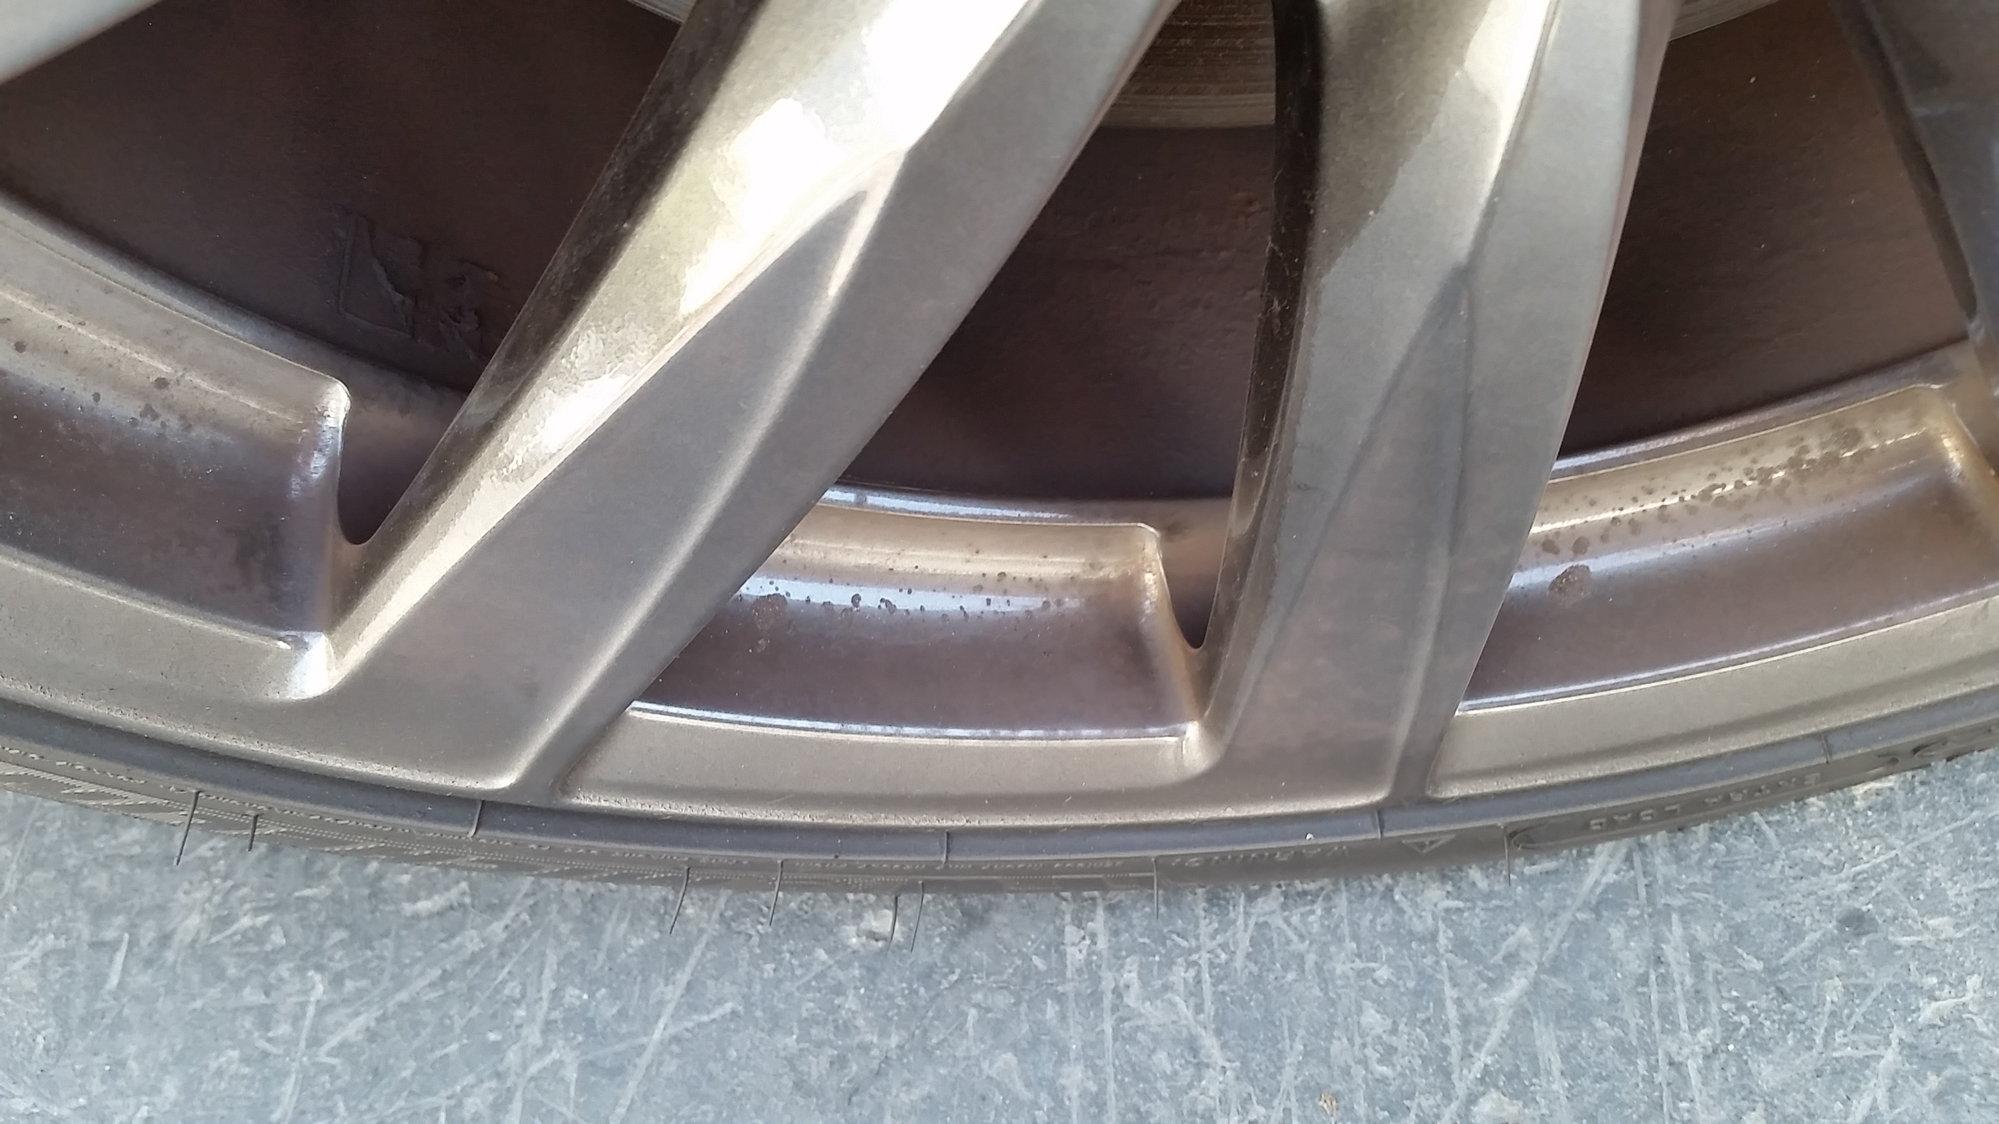 Hawks performance ceramic pads anyone? - ClubLexus - Lexus Forum